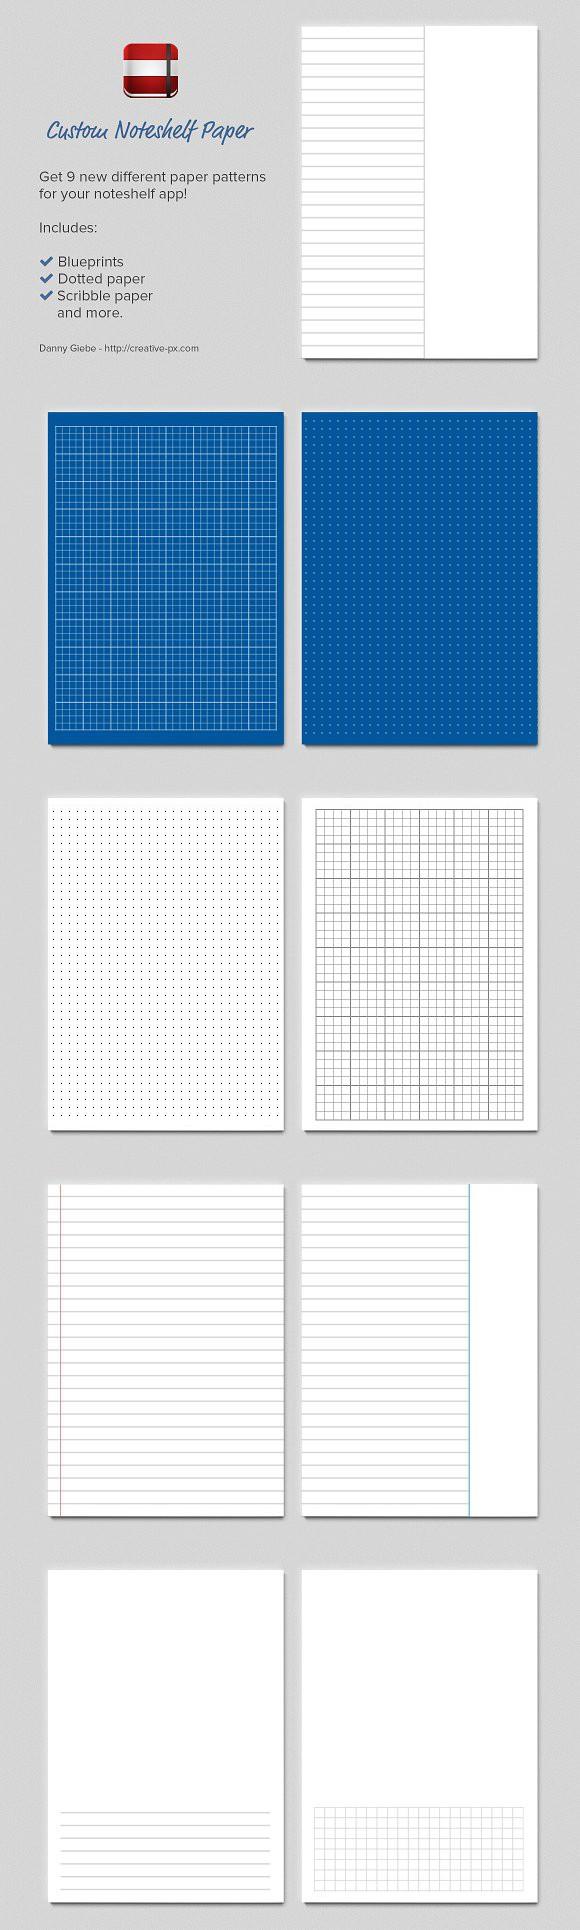 noteshelf custom paper templates